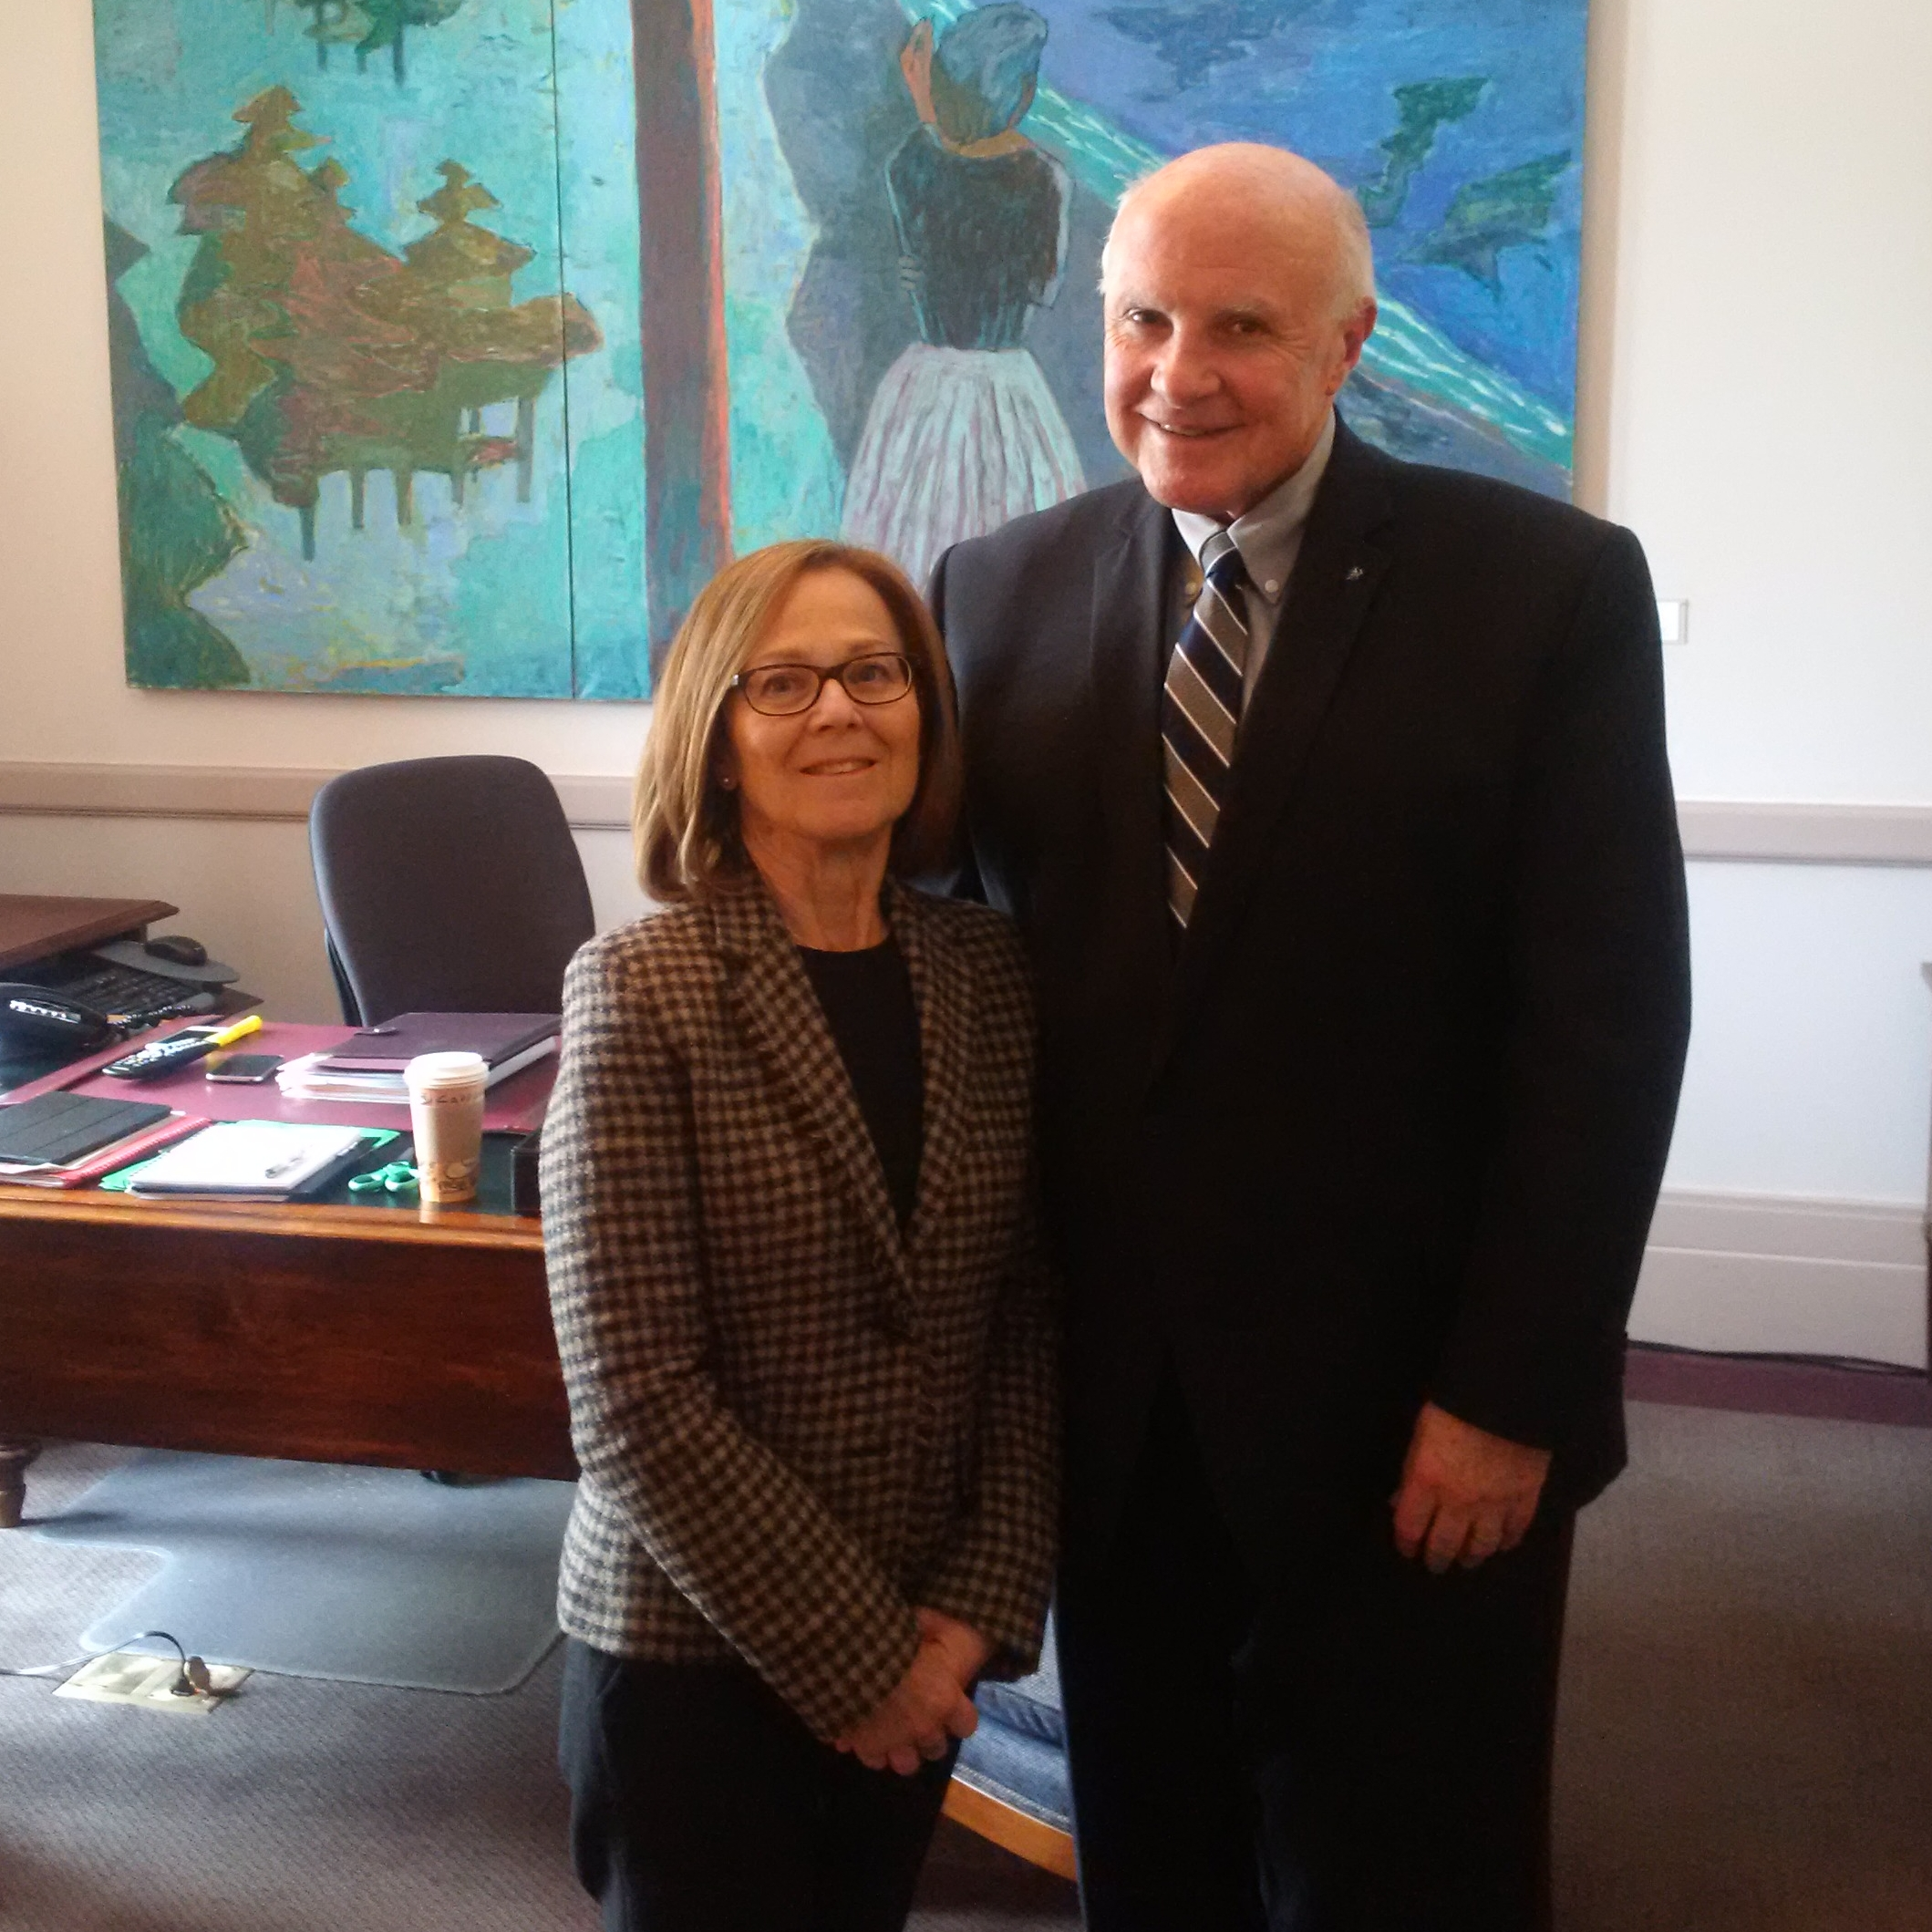 NCACT Spokesperson Gary Grant chatting with Senator Judith Seidman regarding Bill S-5 in Ottawa, February 2017